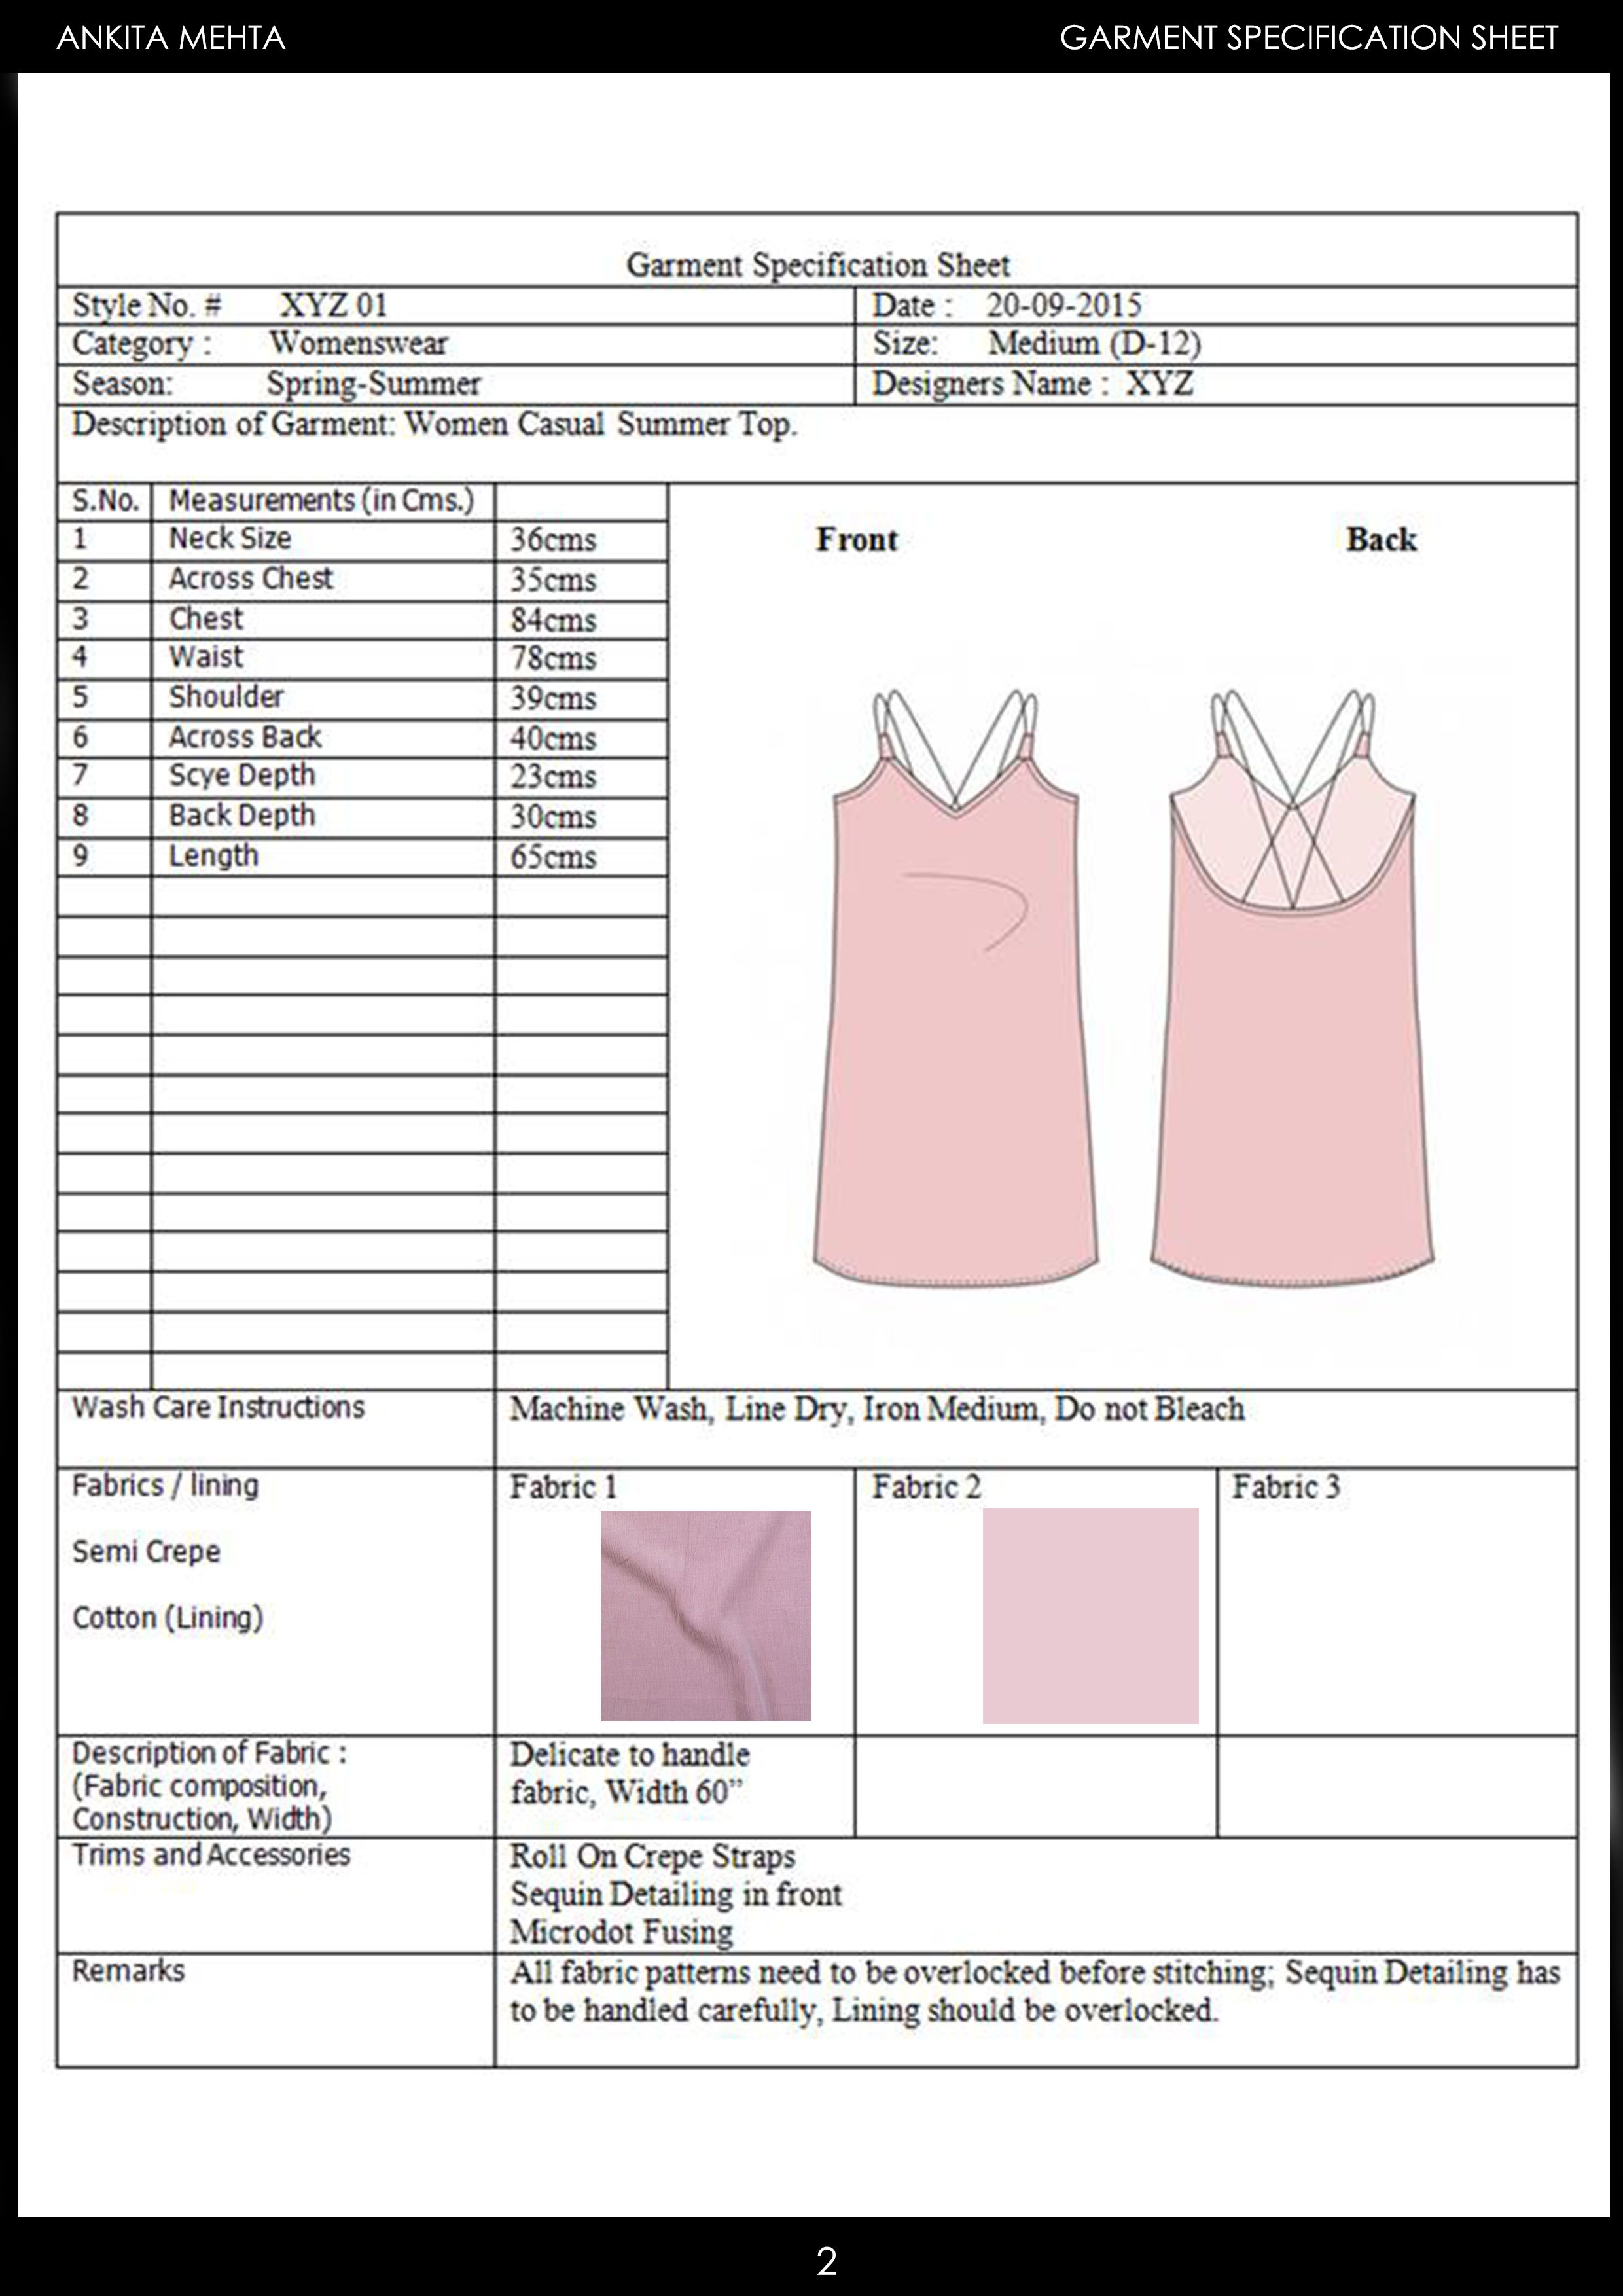 Womenswear Casual Summer Top Garment Specification Sheet Garment